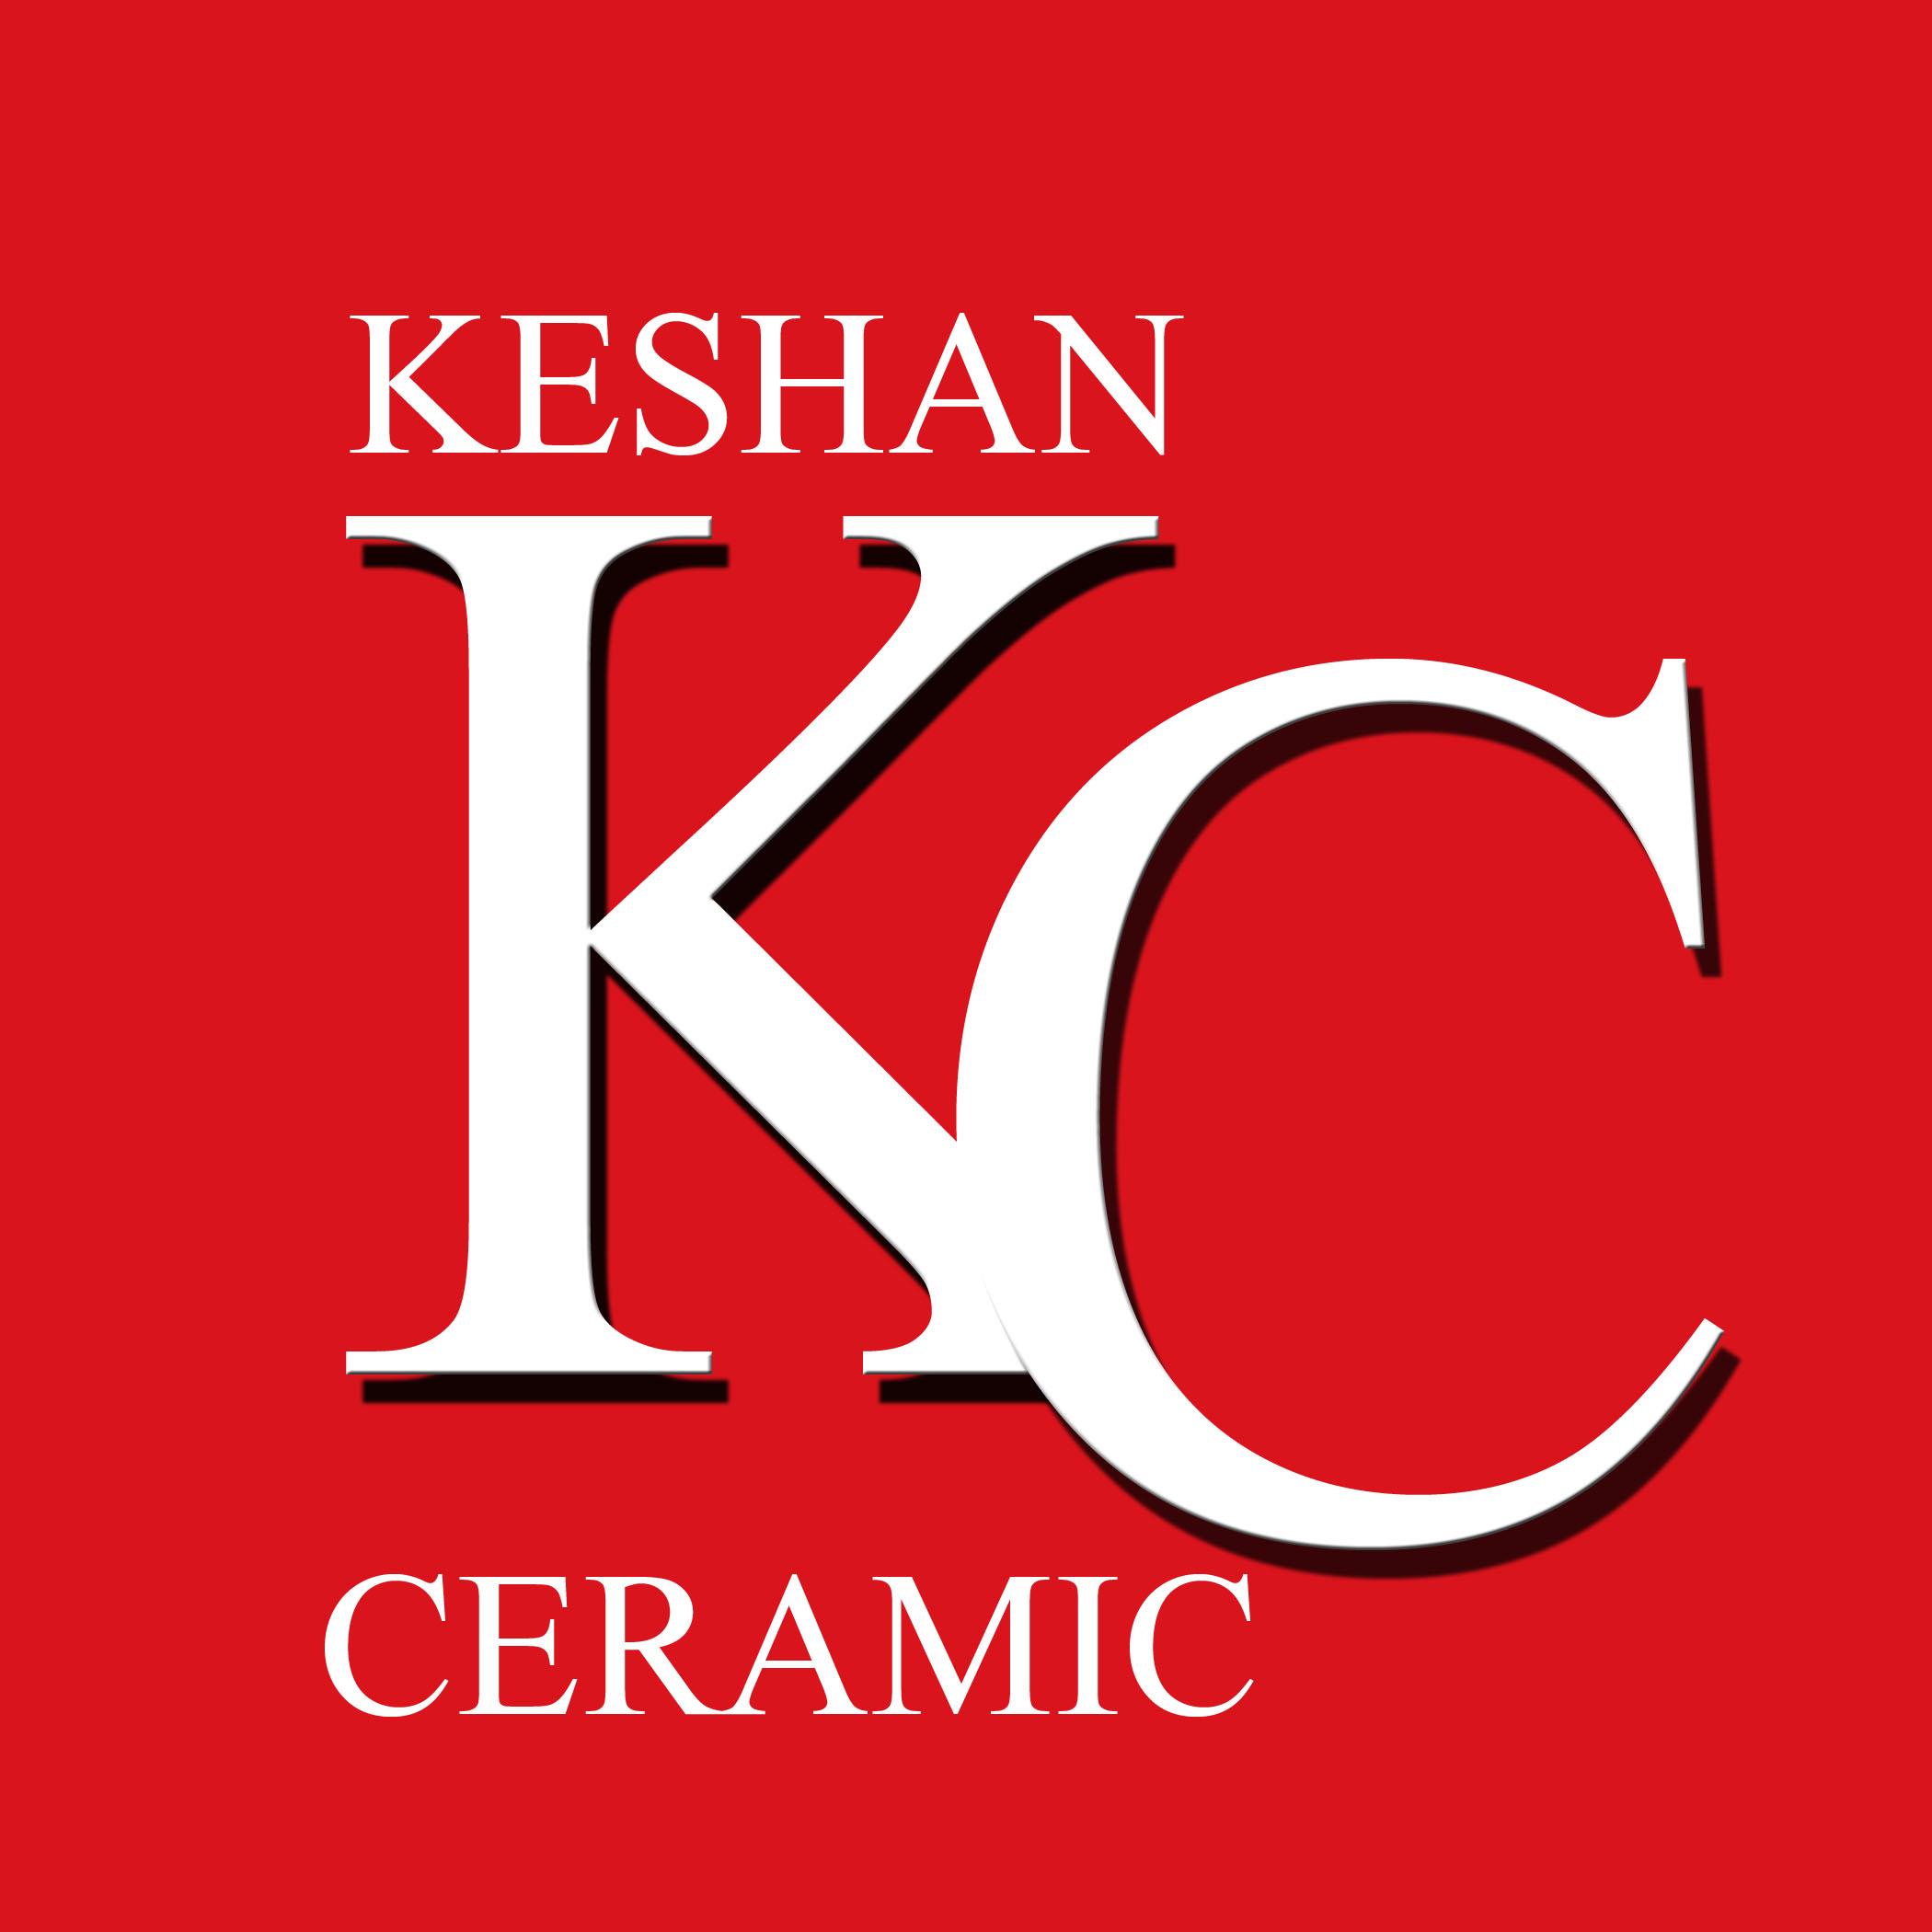 Keshan Ceramic Ja Ela Ceramic Kapuwatta Ceramic Ja Ela Bath Ware